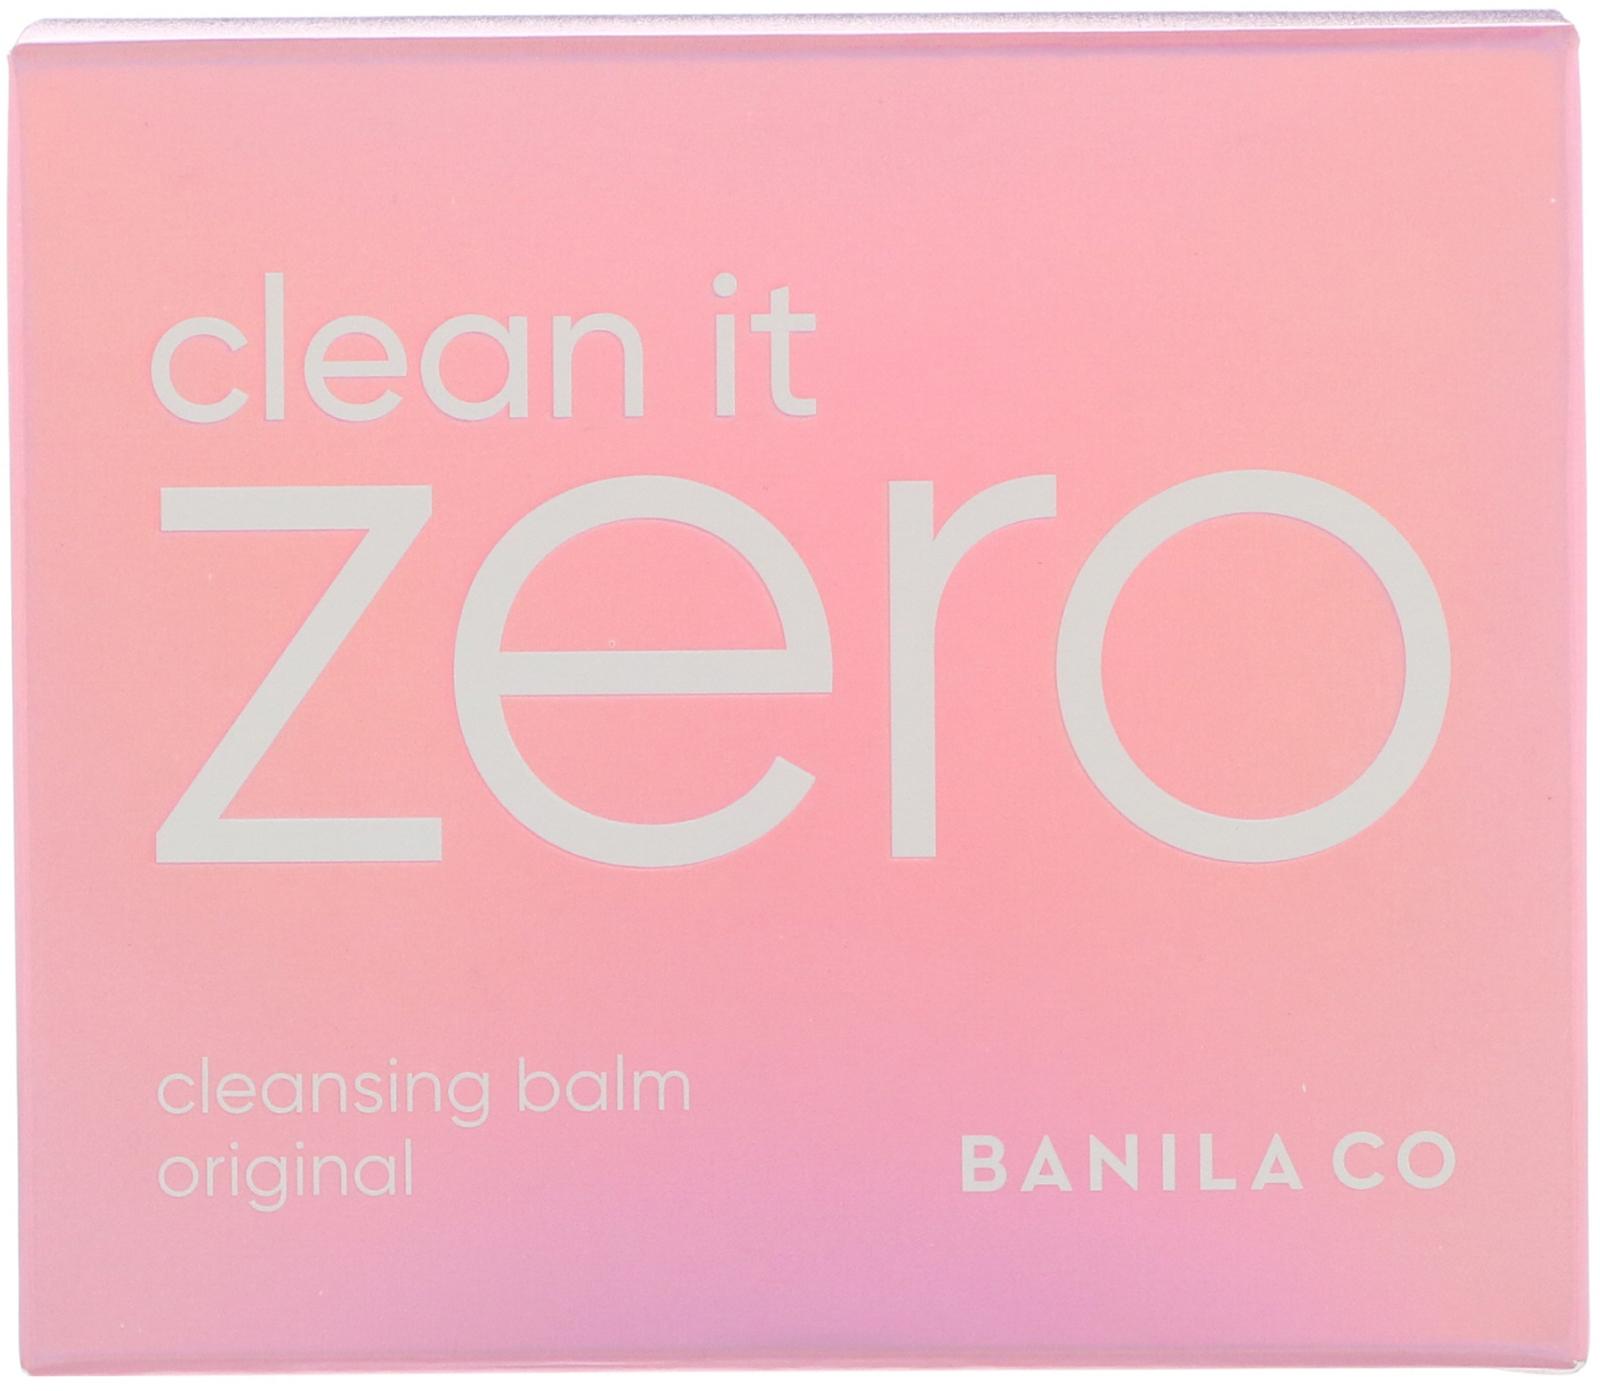 Banila Co Clean It Zero Cleansing Balm Original 338 Fl Oz 100 Nature Republic Himalaya Salt Pink